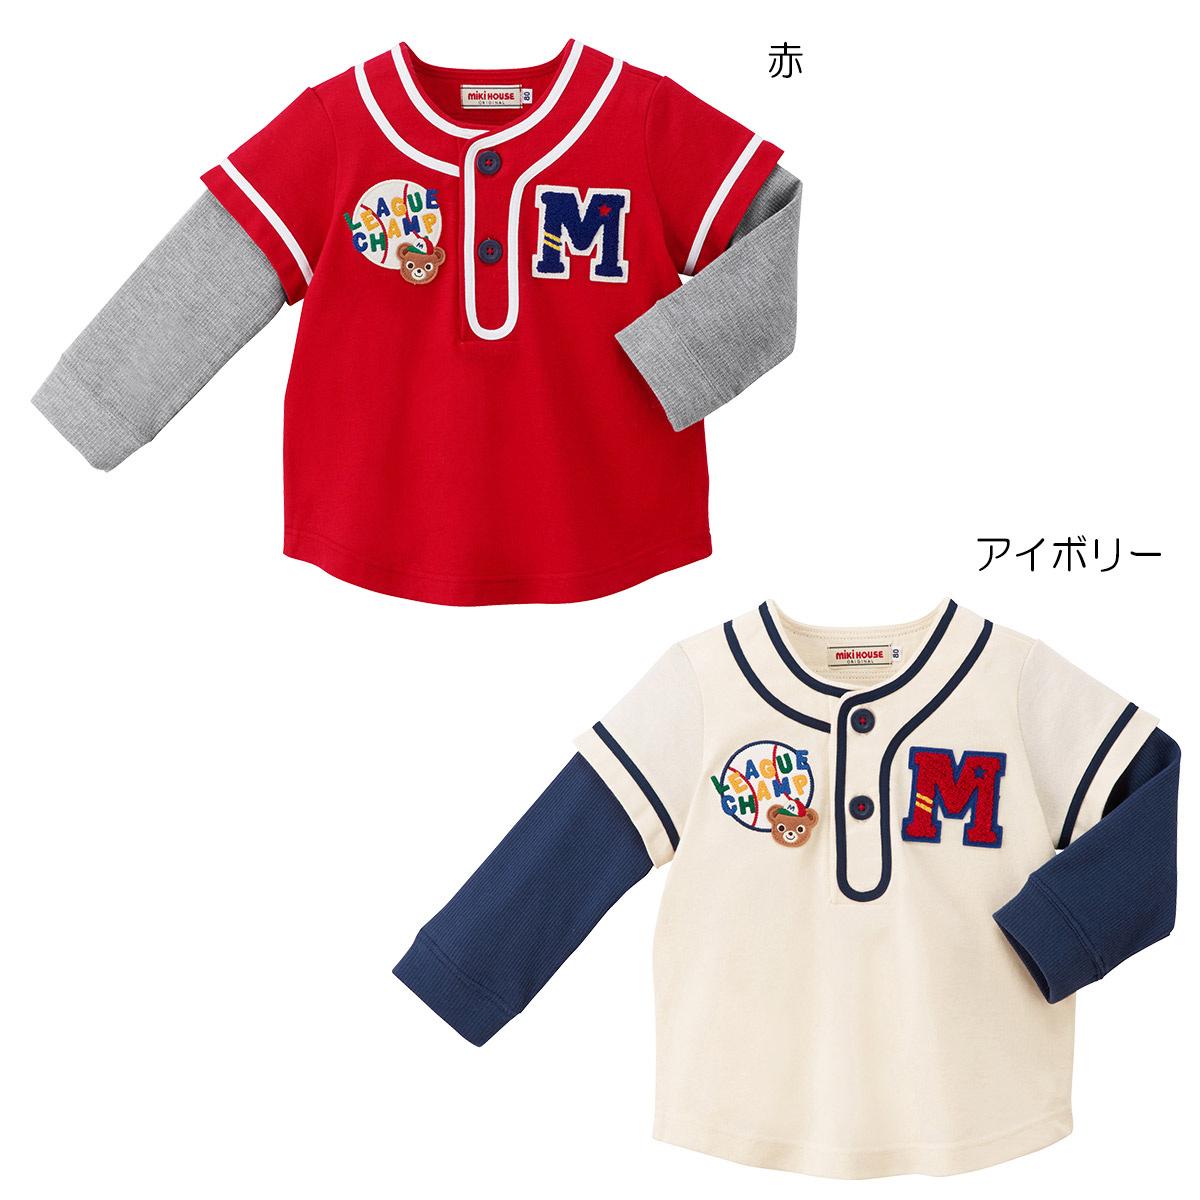 【MIKIHOUSE ミキハウス】ユニフォーム風長袖Tシャツ(80cm・90cm・100cm)